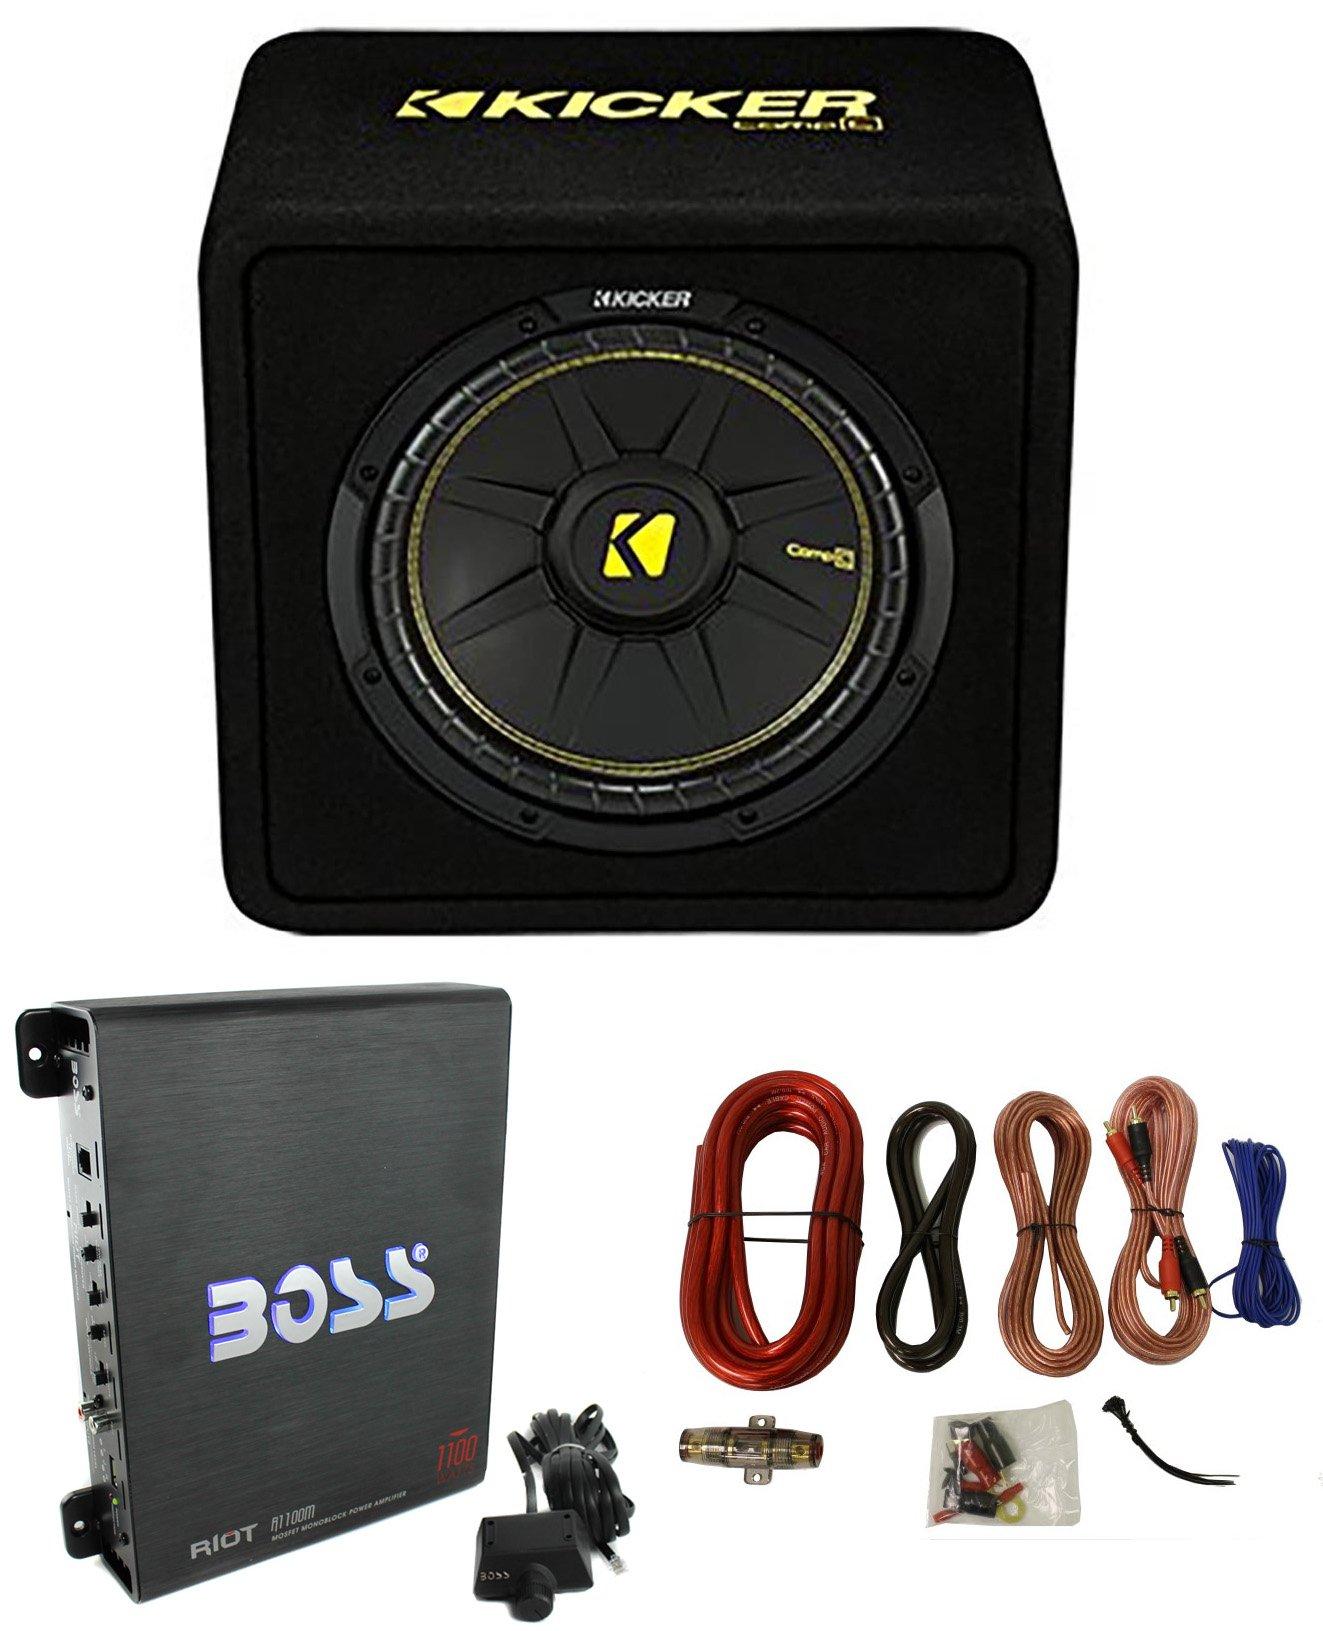 Kicker 44VCWC124 12'' 600W Loaded Car Subwoofer + Enclosure + 1100W Amp + Amp Kit